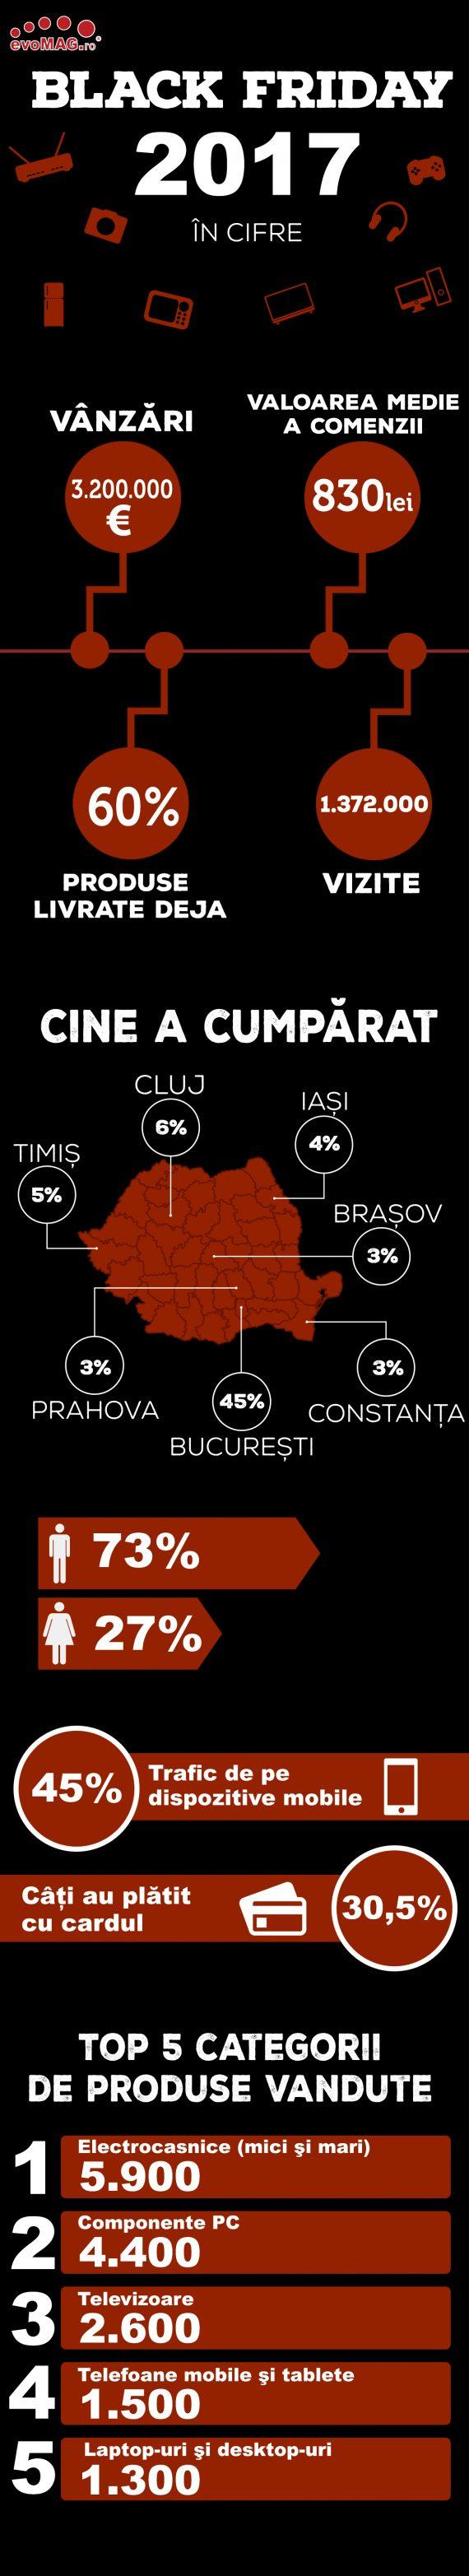 Infografic_evoMAG_Black_Friday_2017